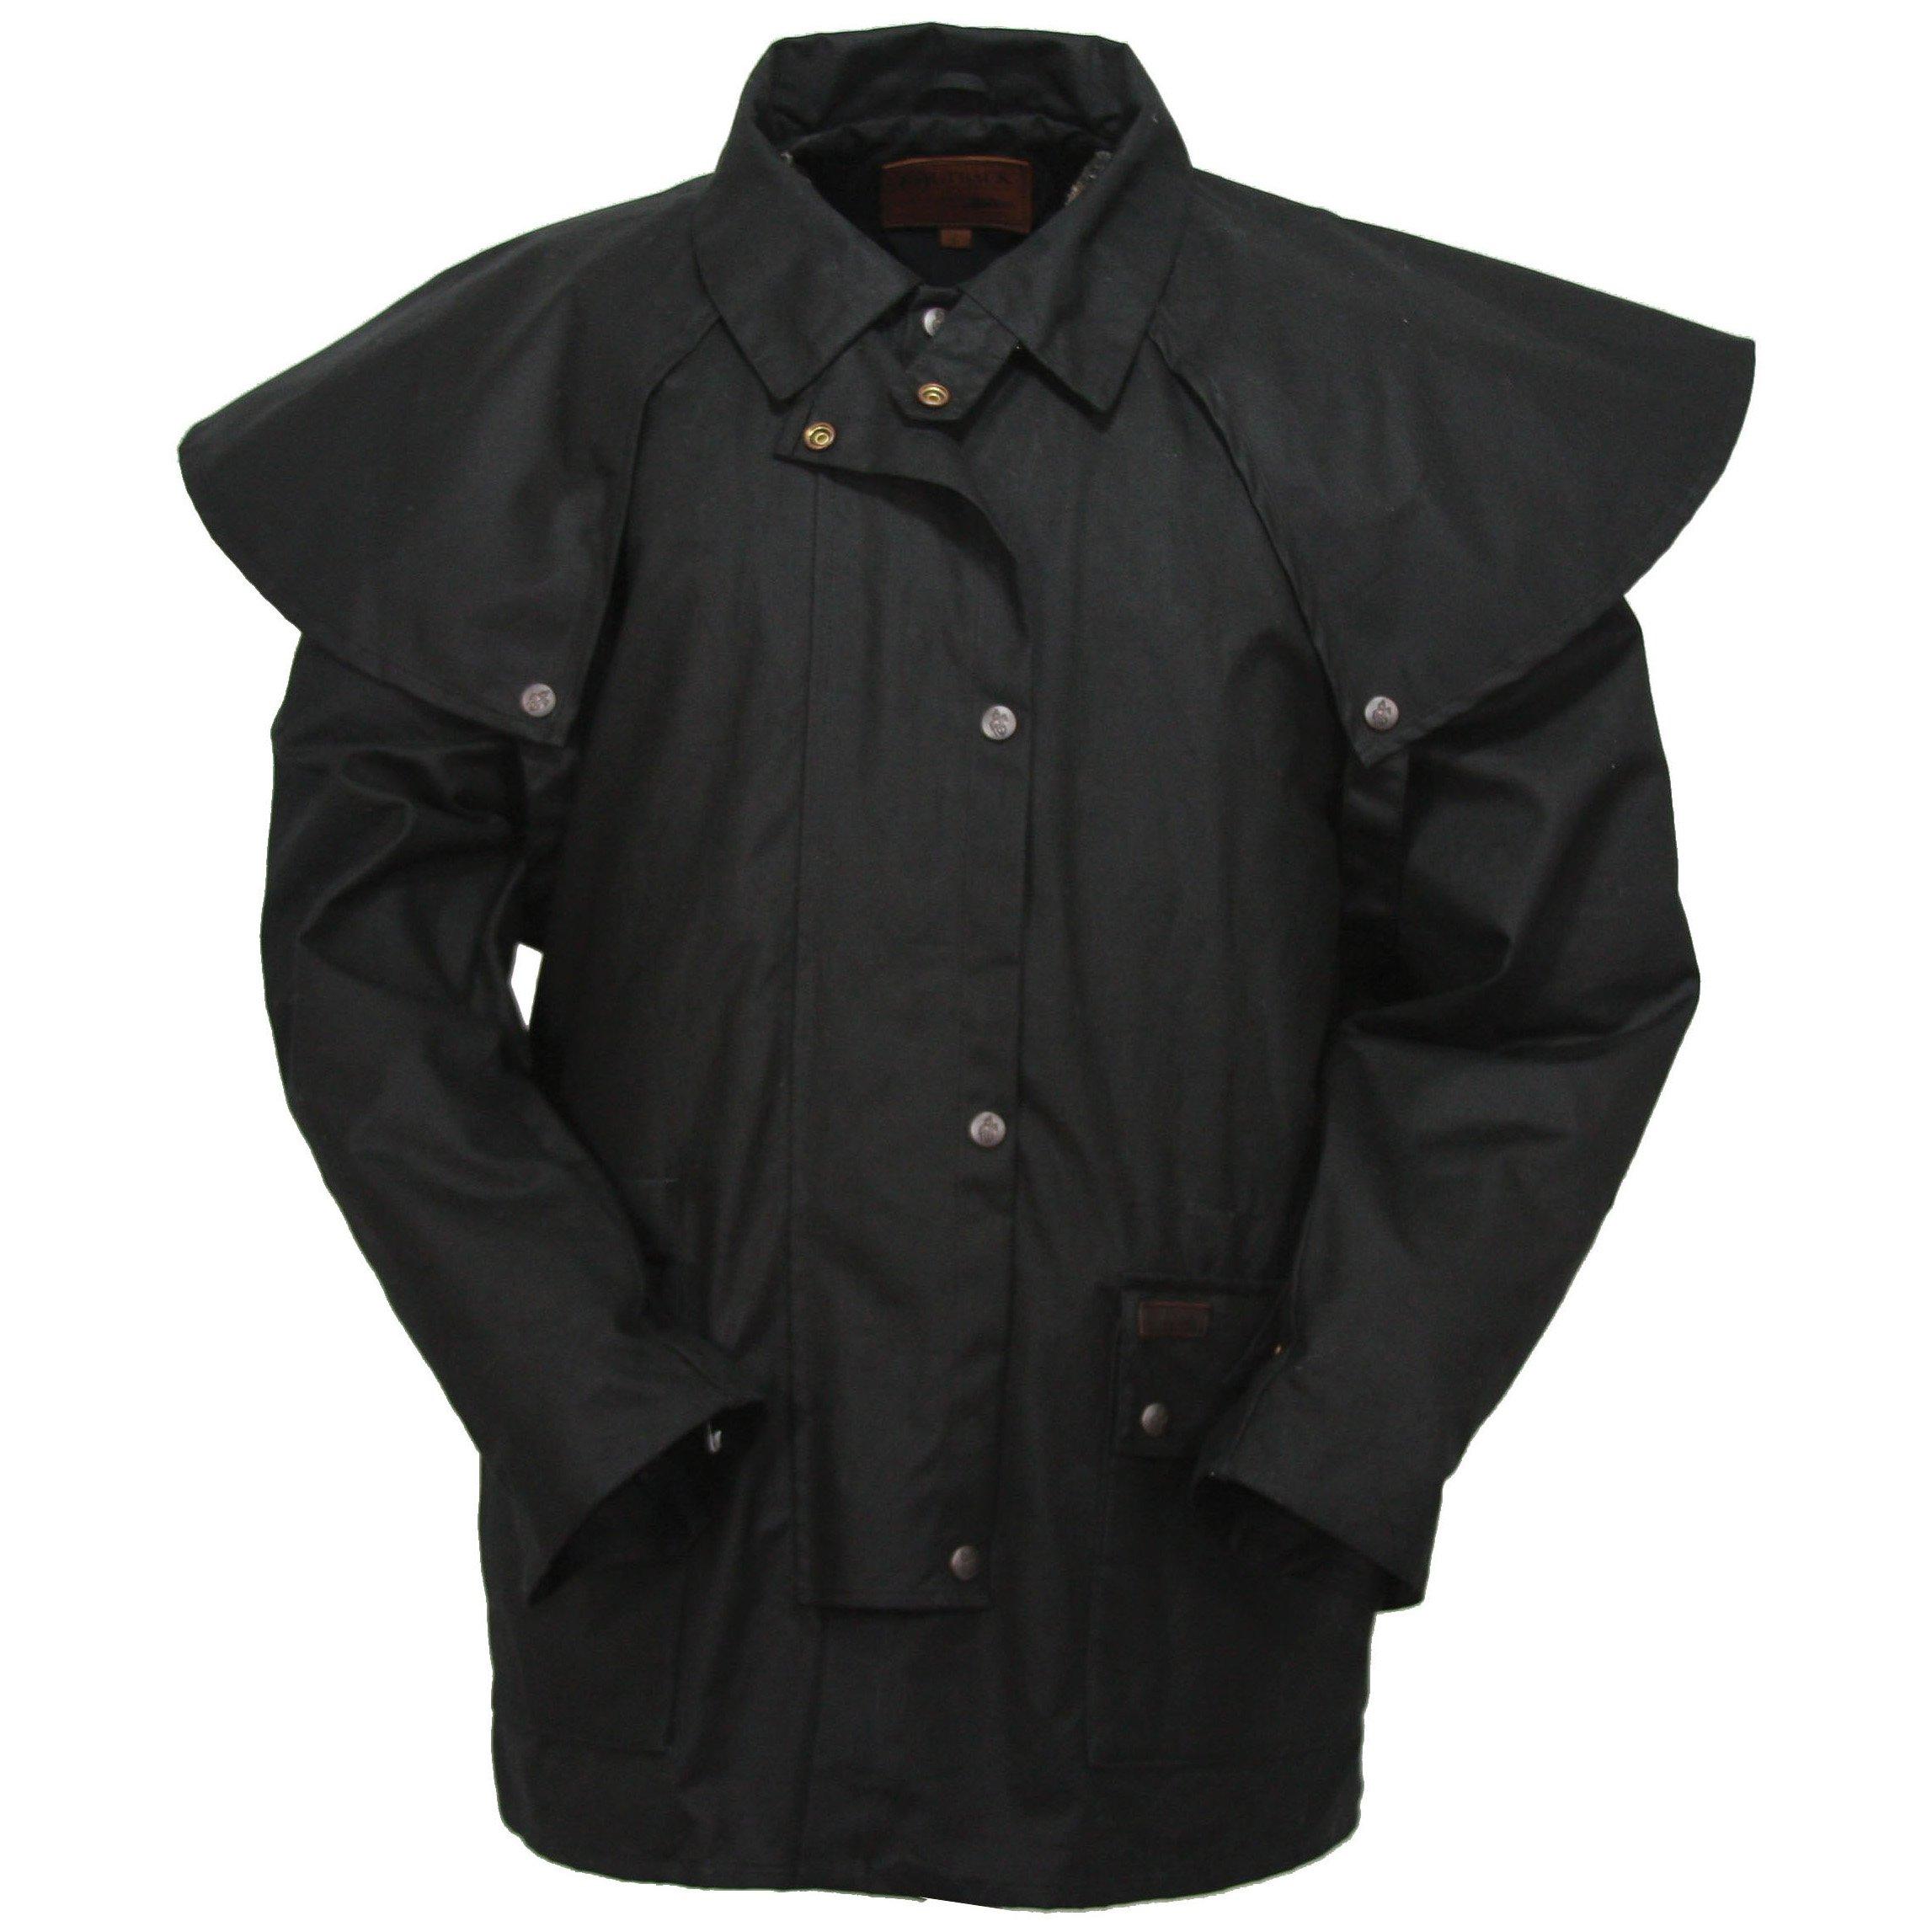 Outback Trading Company Bush Ranger Jacket, Brown, 3XL